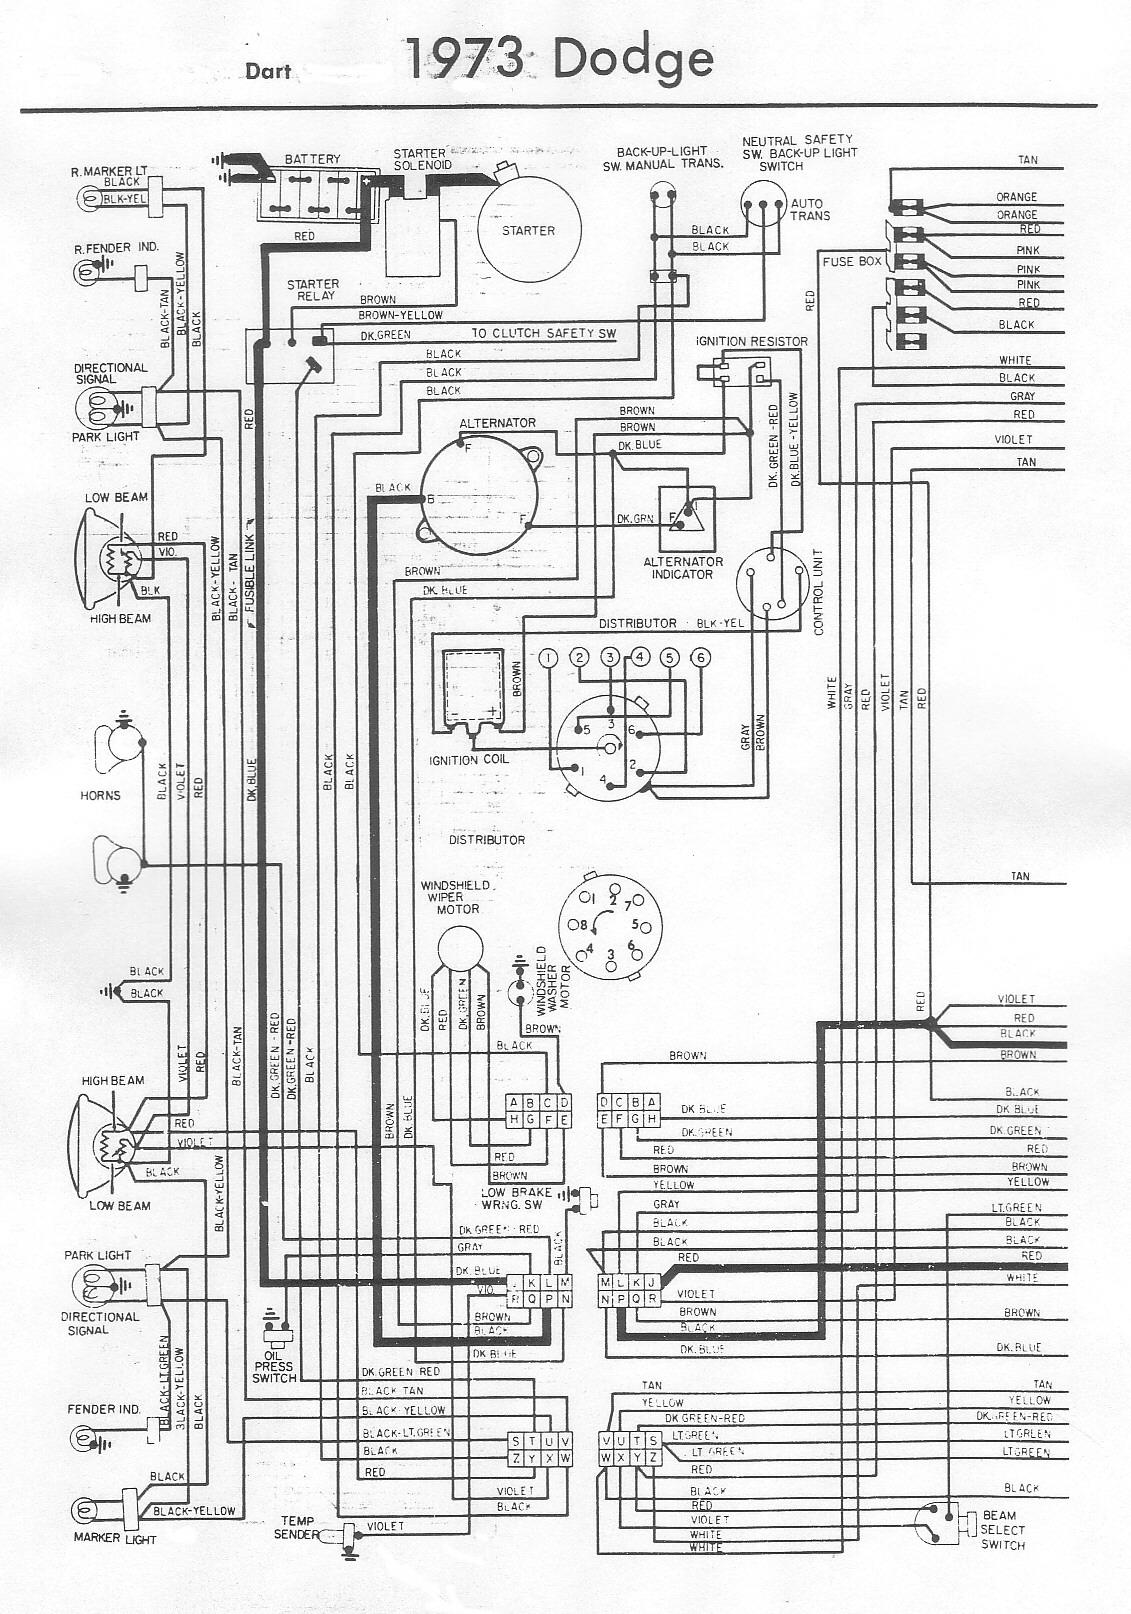 medium resolution of diagram further 1973 dodge charger wiring diagram wiring harness73 dodge charger wiring diagram online wiring diagram